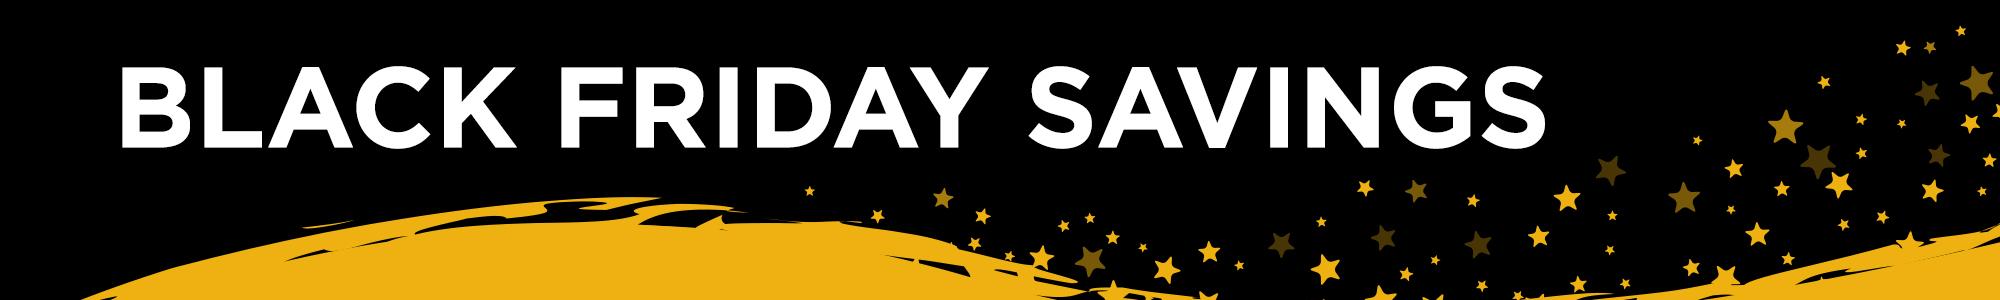 Black Friday Savings Banner